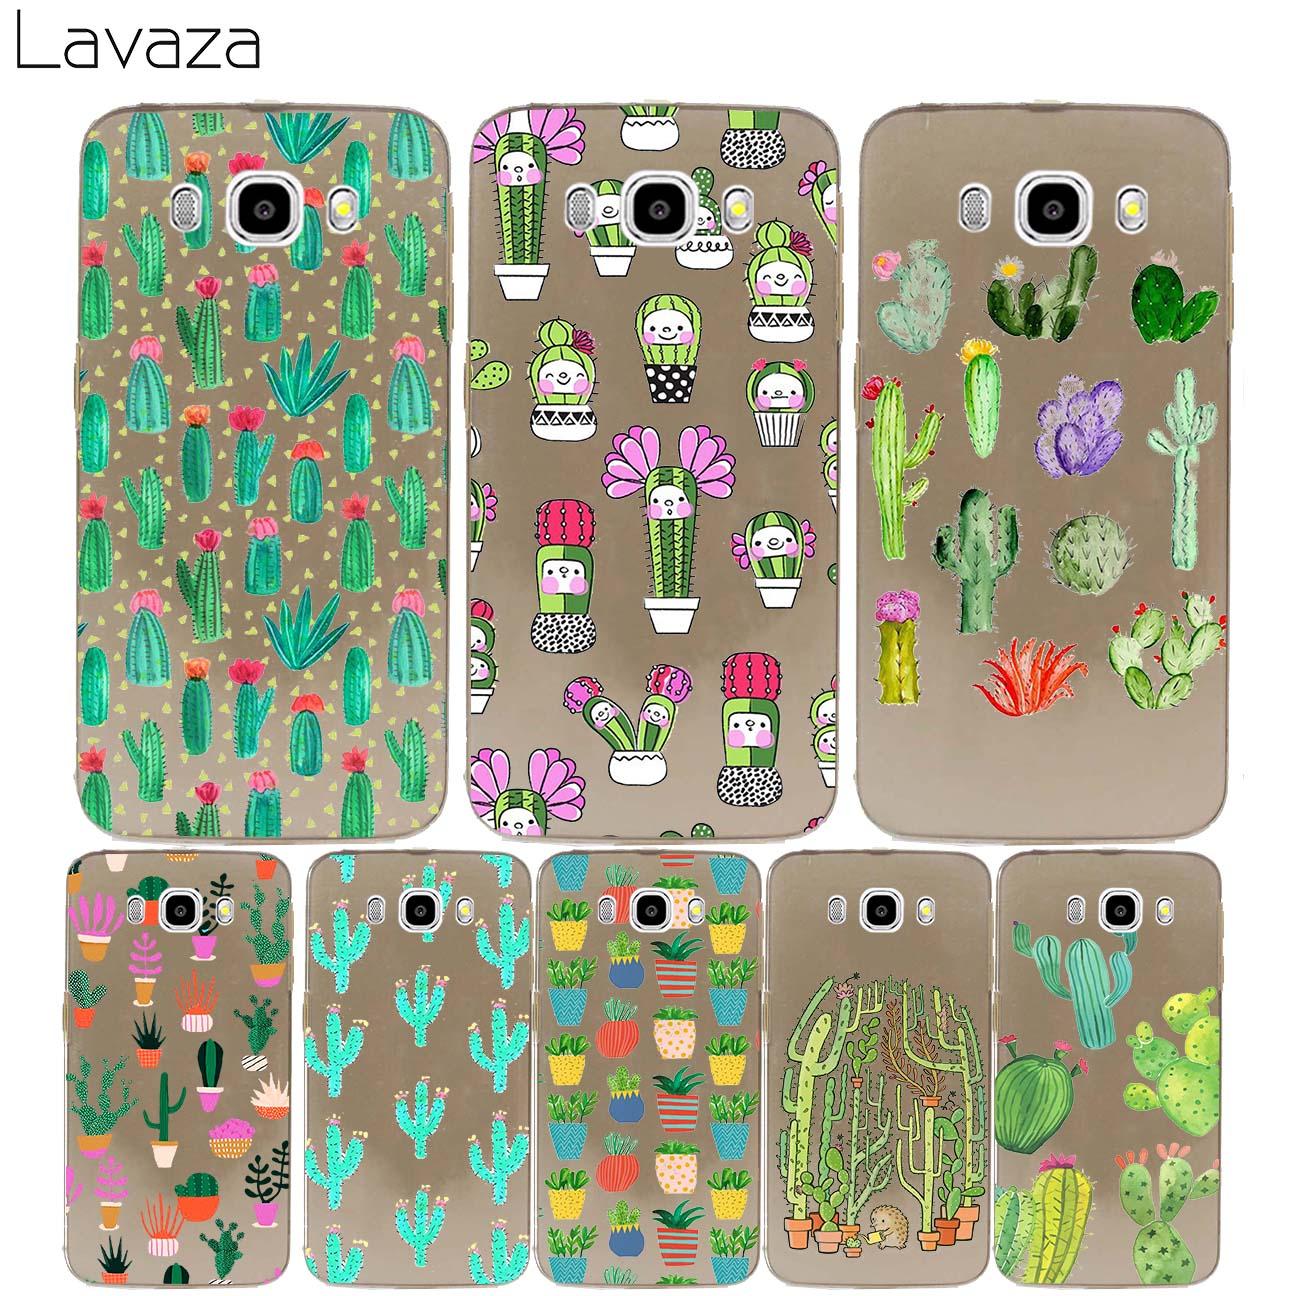 Lavaza Cactus Flower Hard cover case for Samsung Galaxy J3 J5 J7 2017 J1 J2 2016 2015 Ace Pro Prime 2018